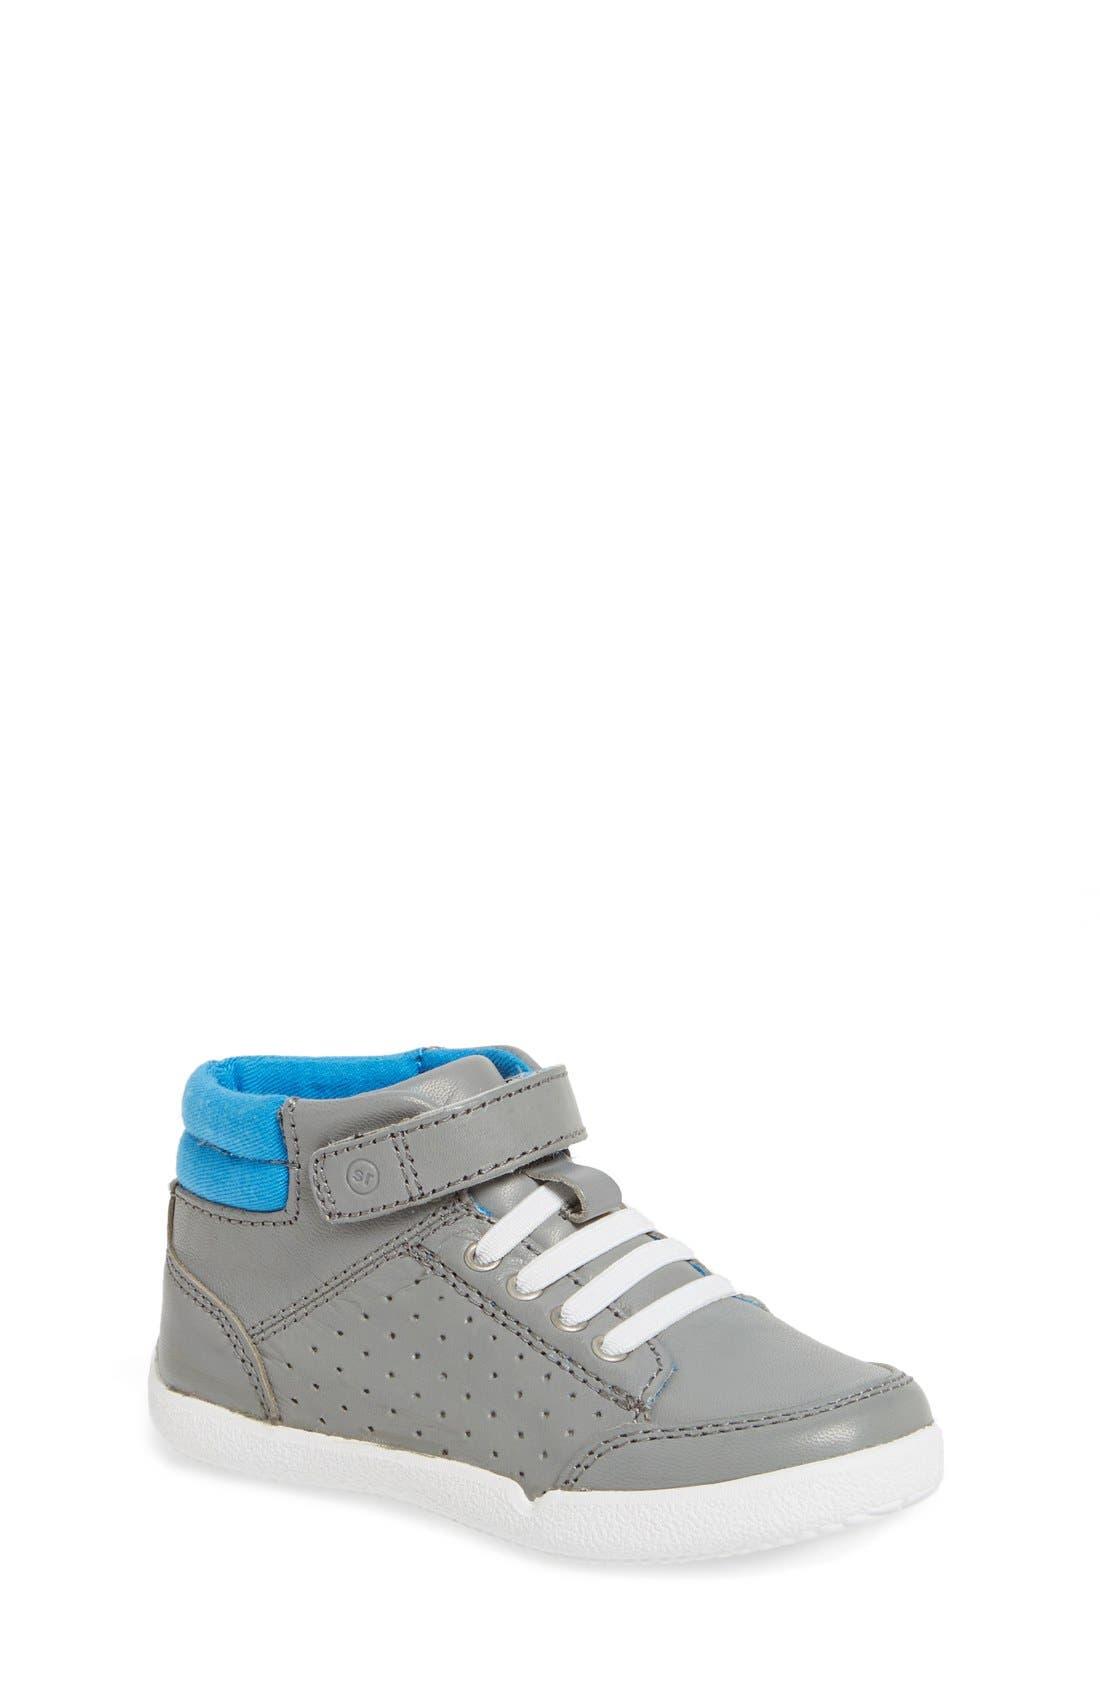 'Stone' Sneaker,                             Main thumbnail 1, color,                             020